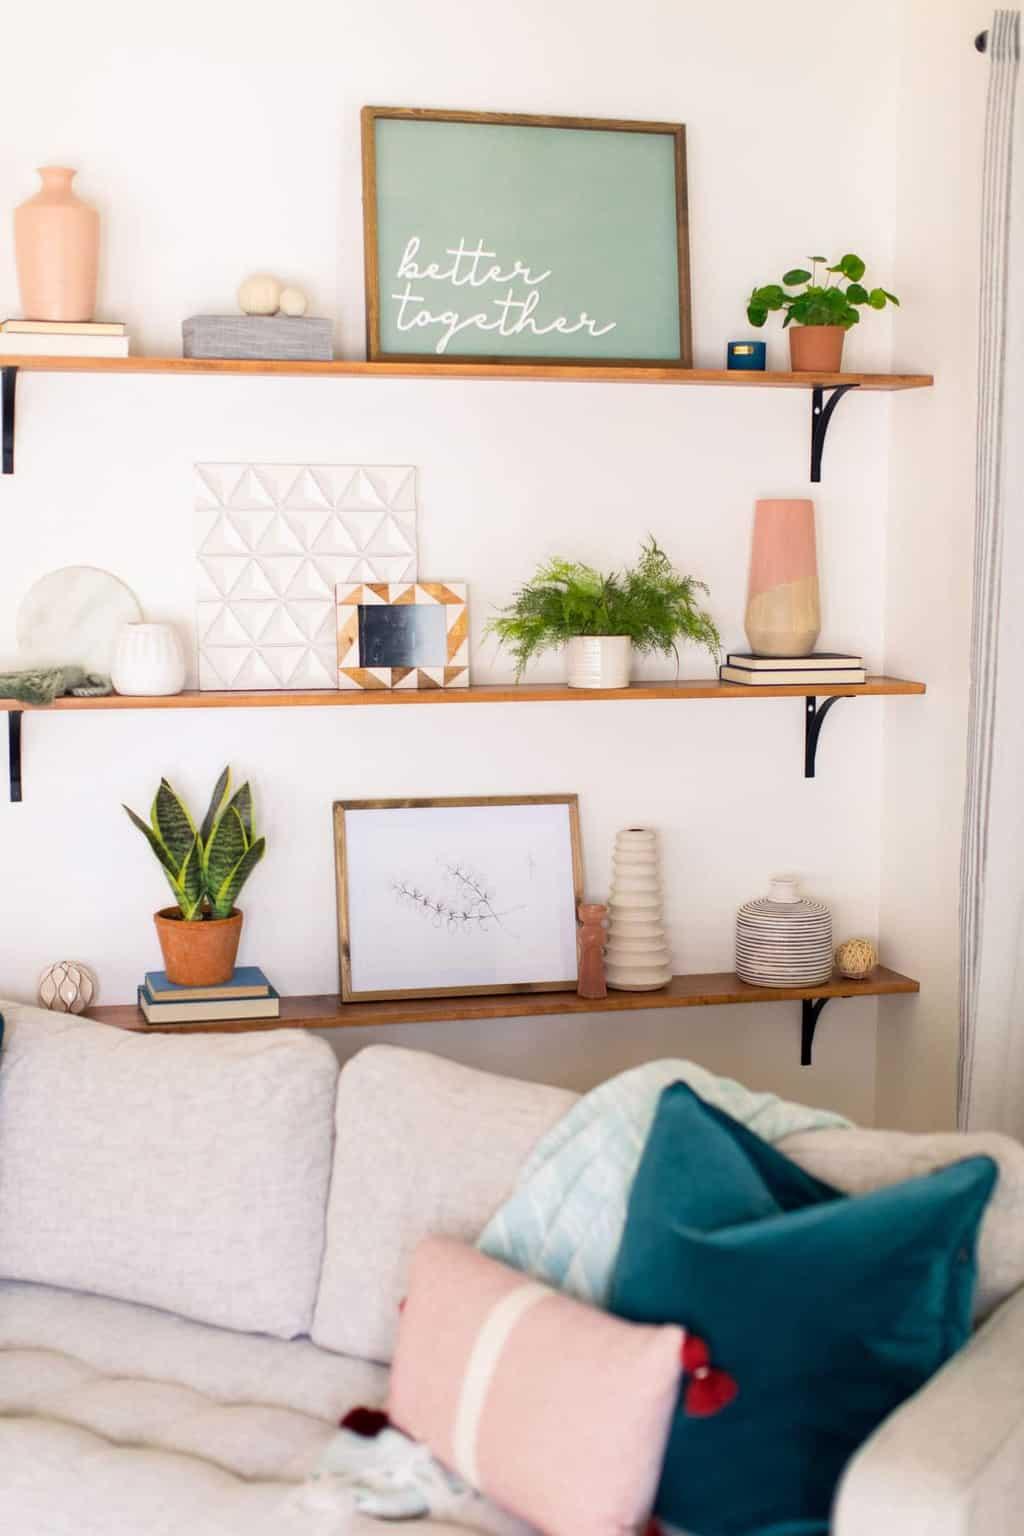 styled bookshelves behind a sofa